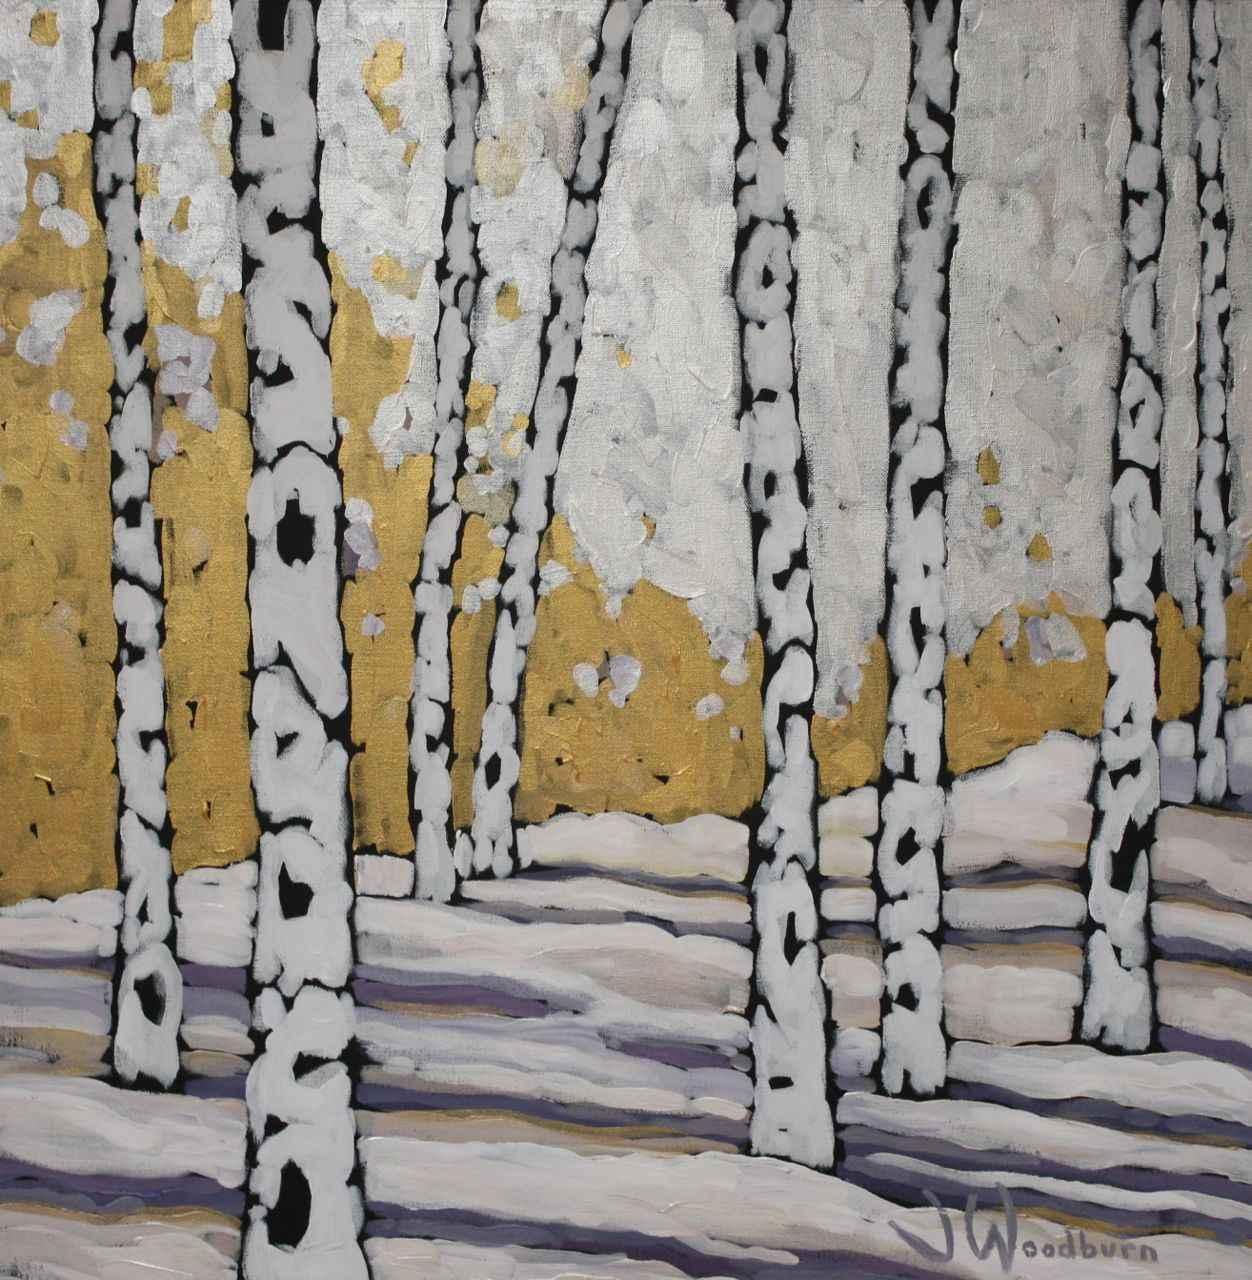 Golden Light of Winter by Ms Jennifer Woodburn - Masterpiece Online